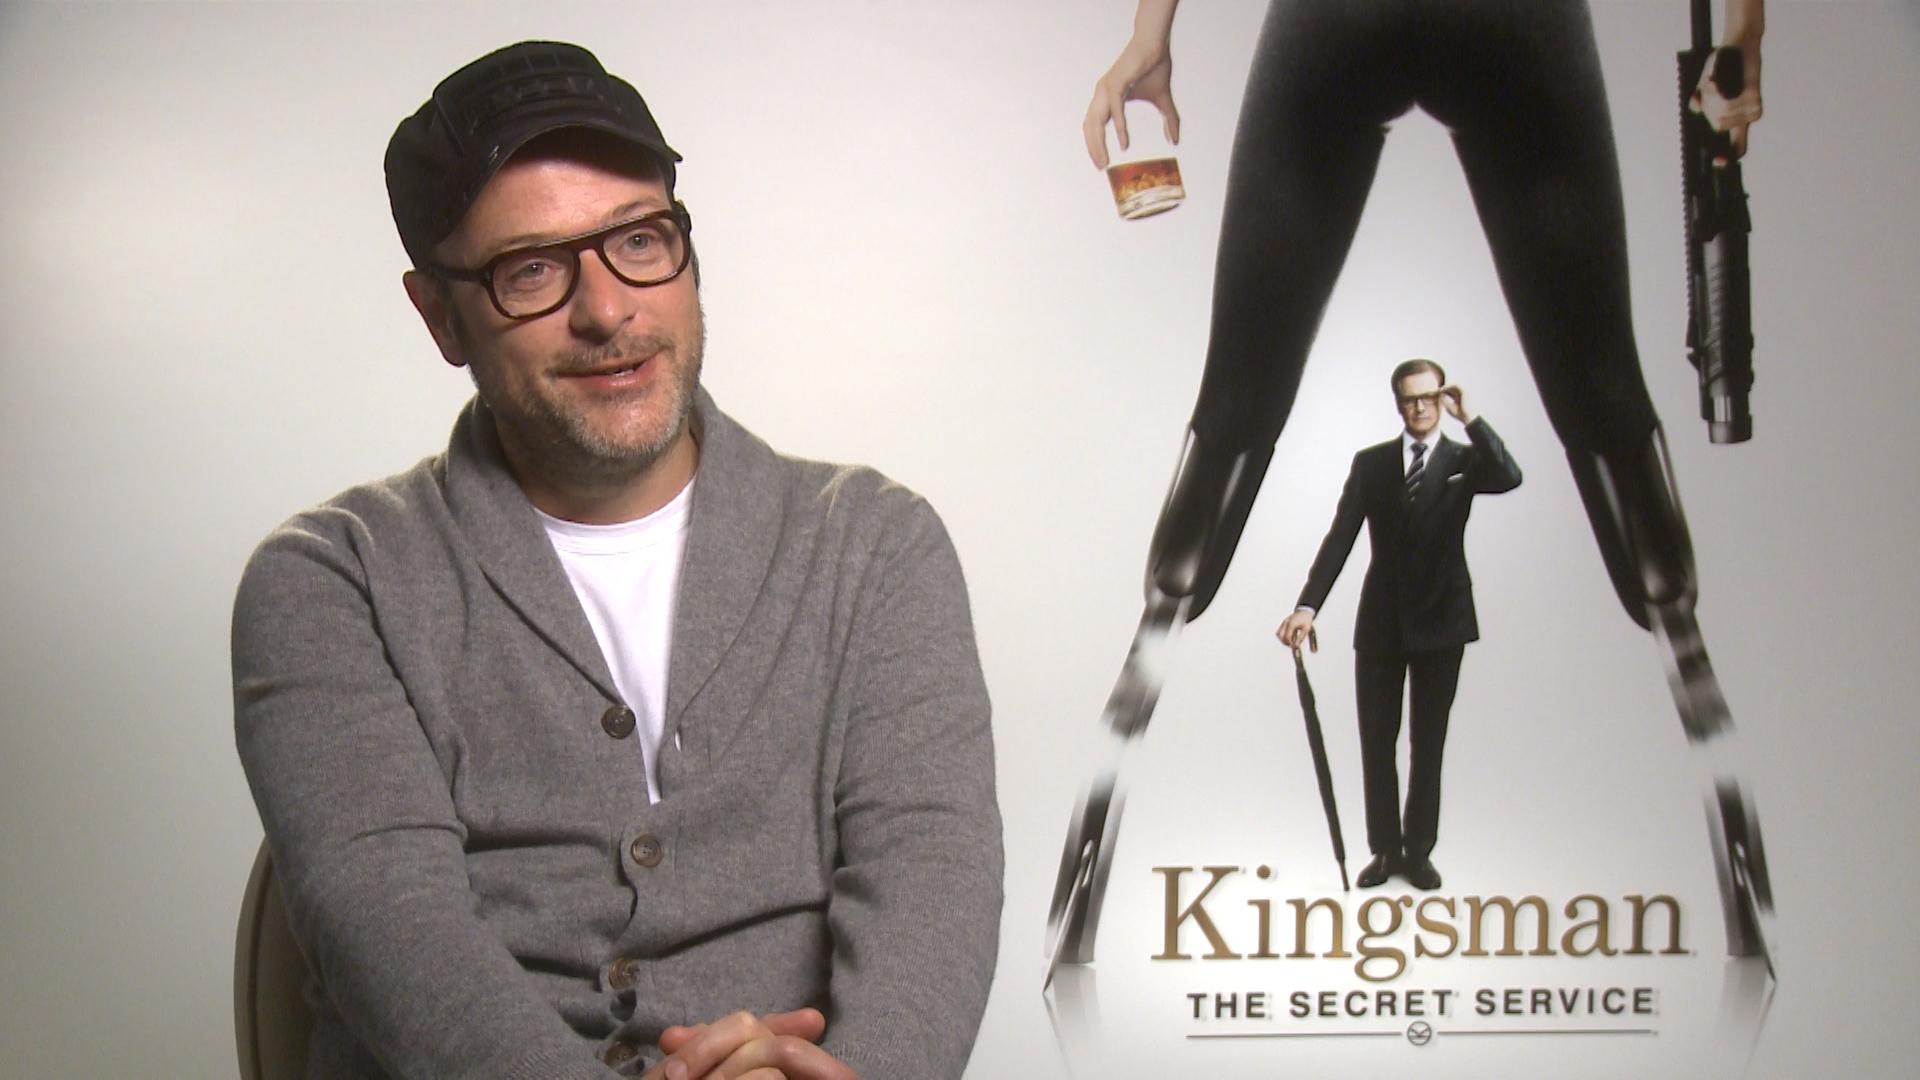 Kingsman The Secret Service Interview: Matthew Vaughn On Kingsman: The Secret Service & The Lack